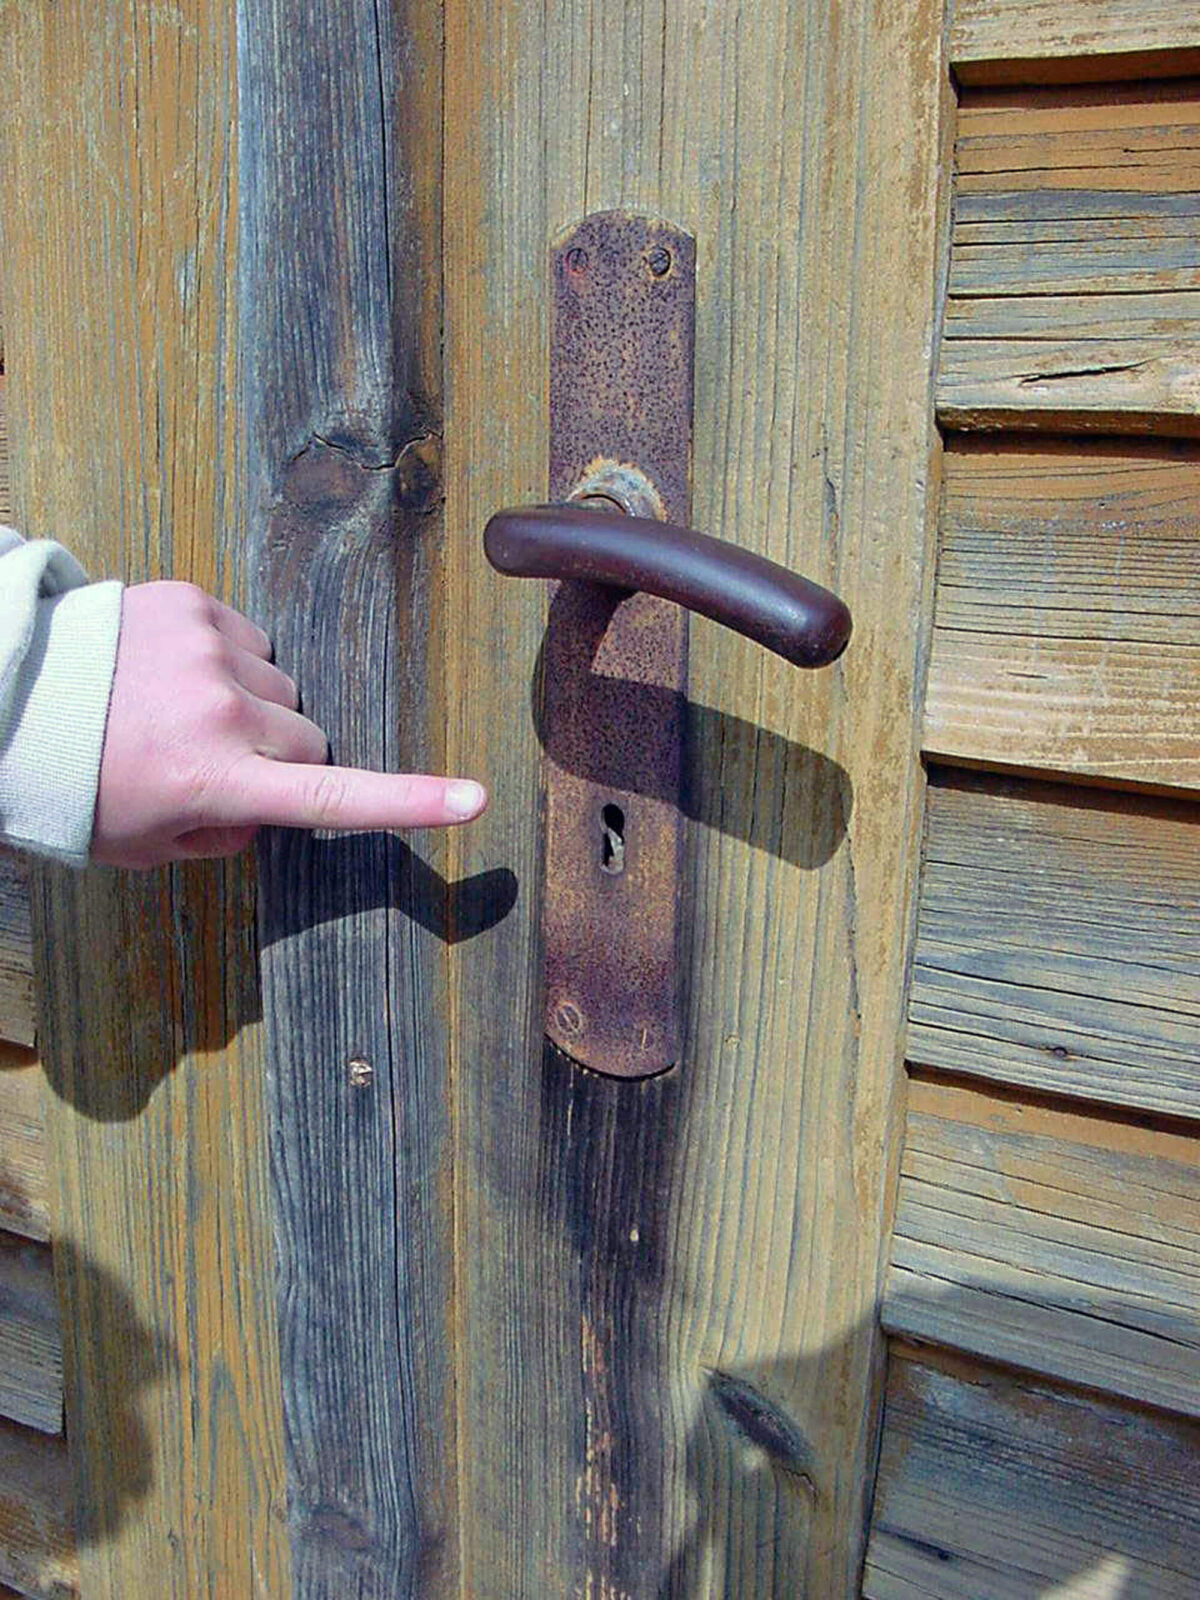 BAVARIA VINTAGE DOOR HANDLE.